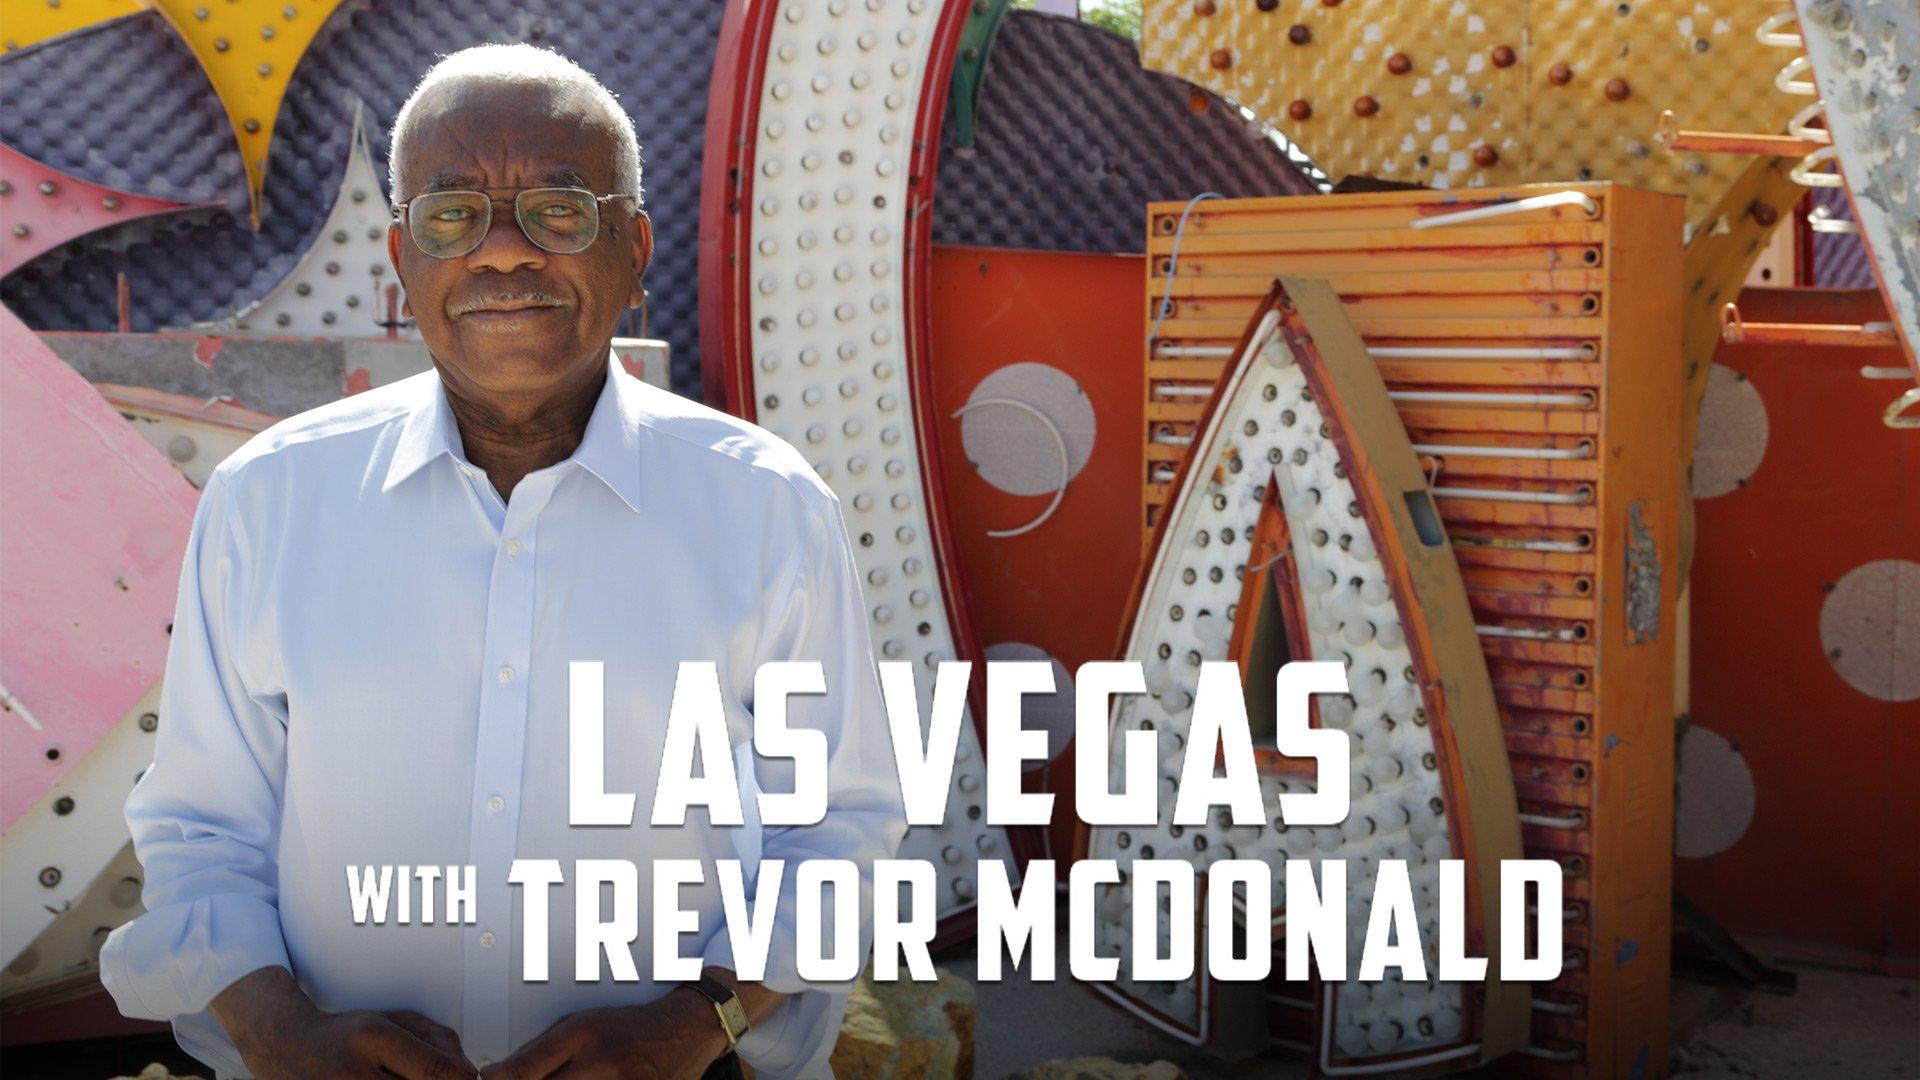 Las Vegas with Trevor Mcdonald on BritBox UK